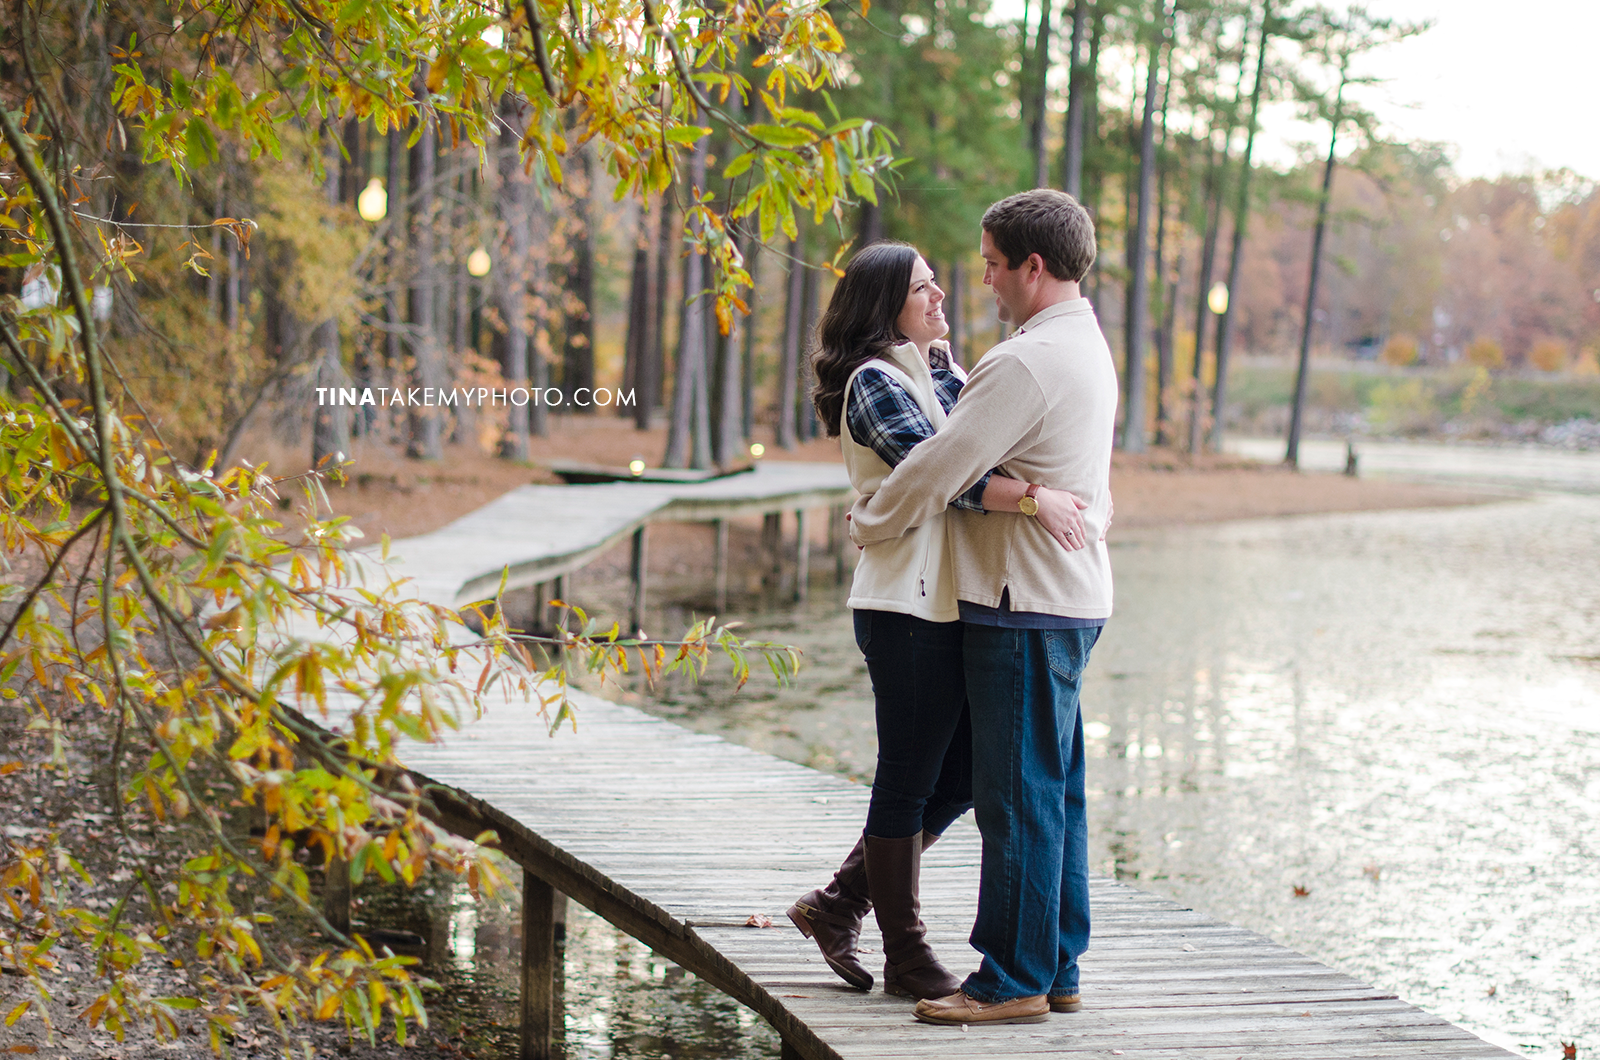 Midlothian-Swift-Creek-Woodlake-Engagement-Photographer-Fall-Woods (24)